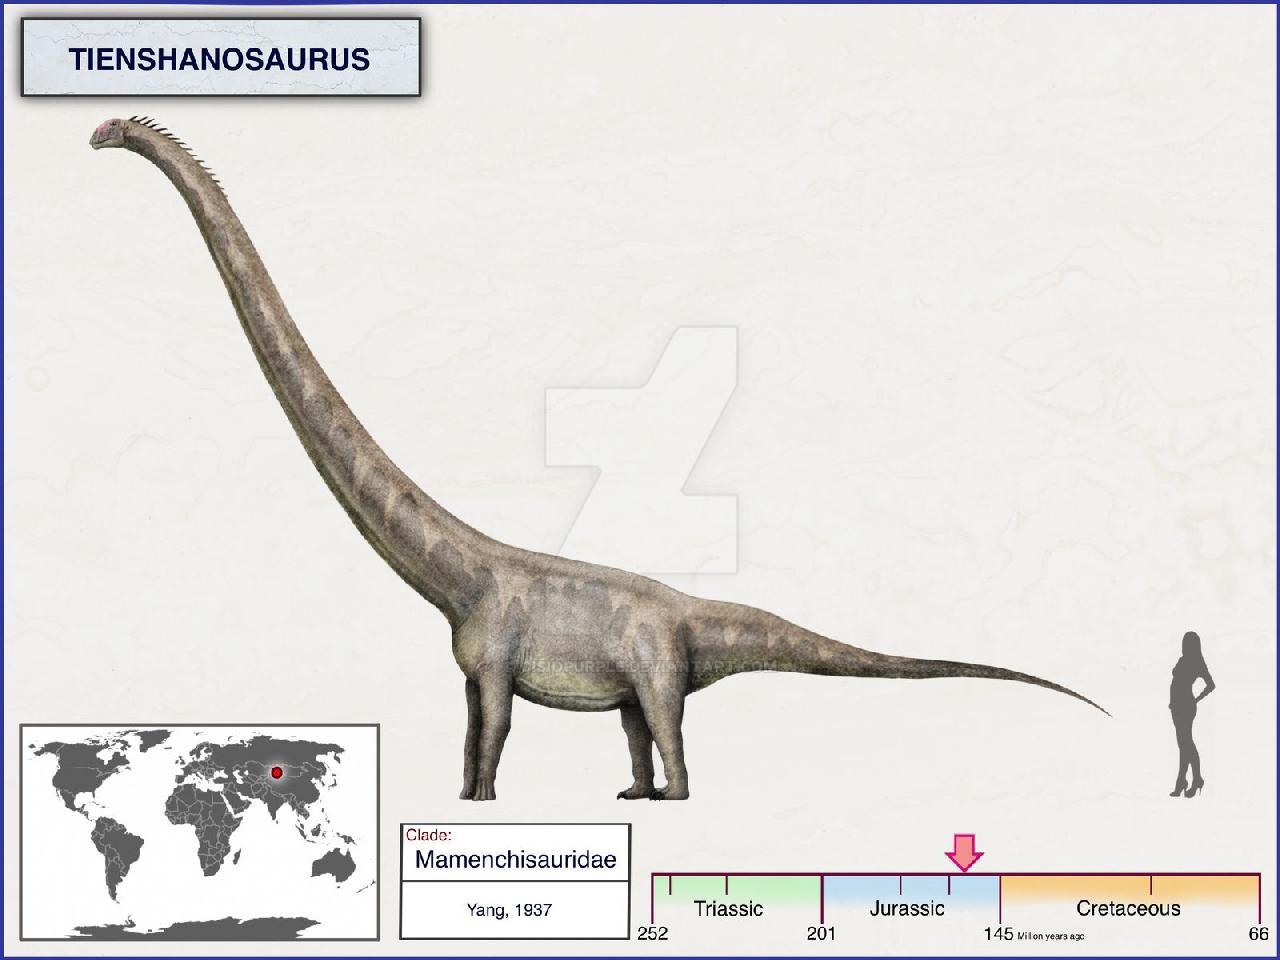 Tienshanosaurus